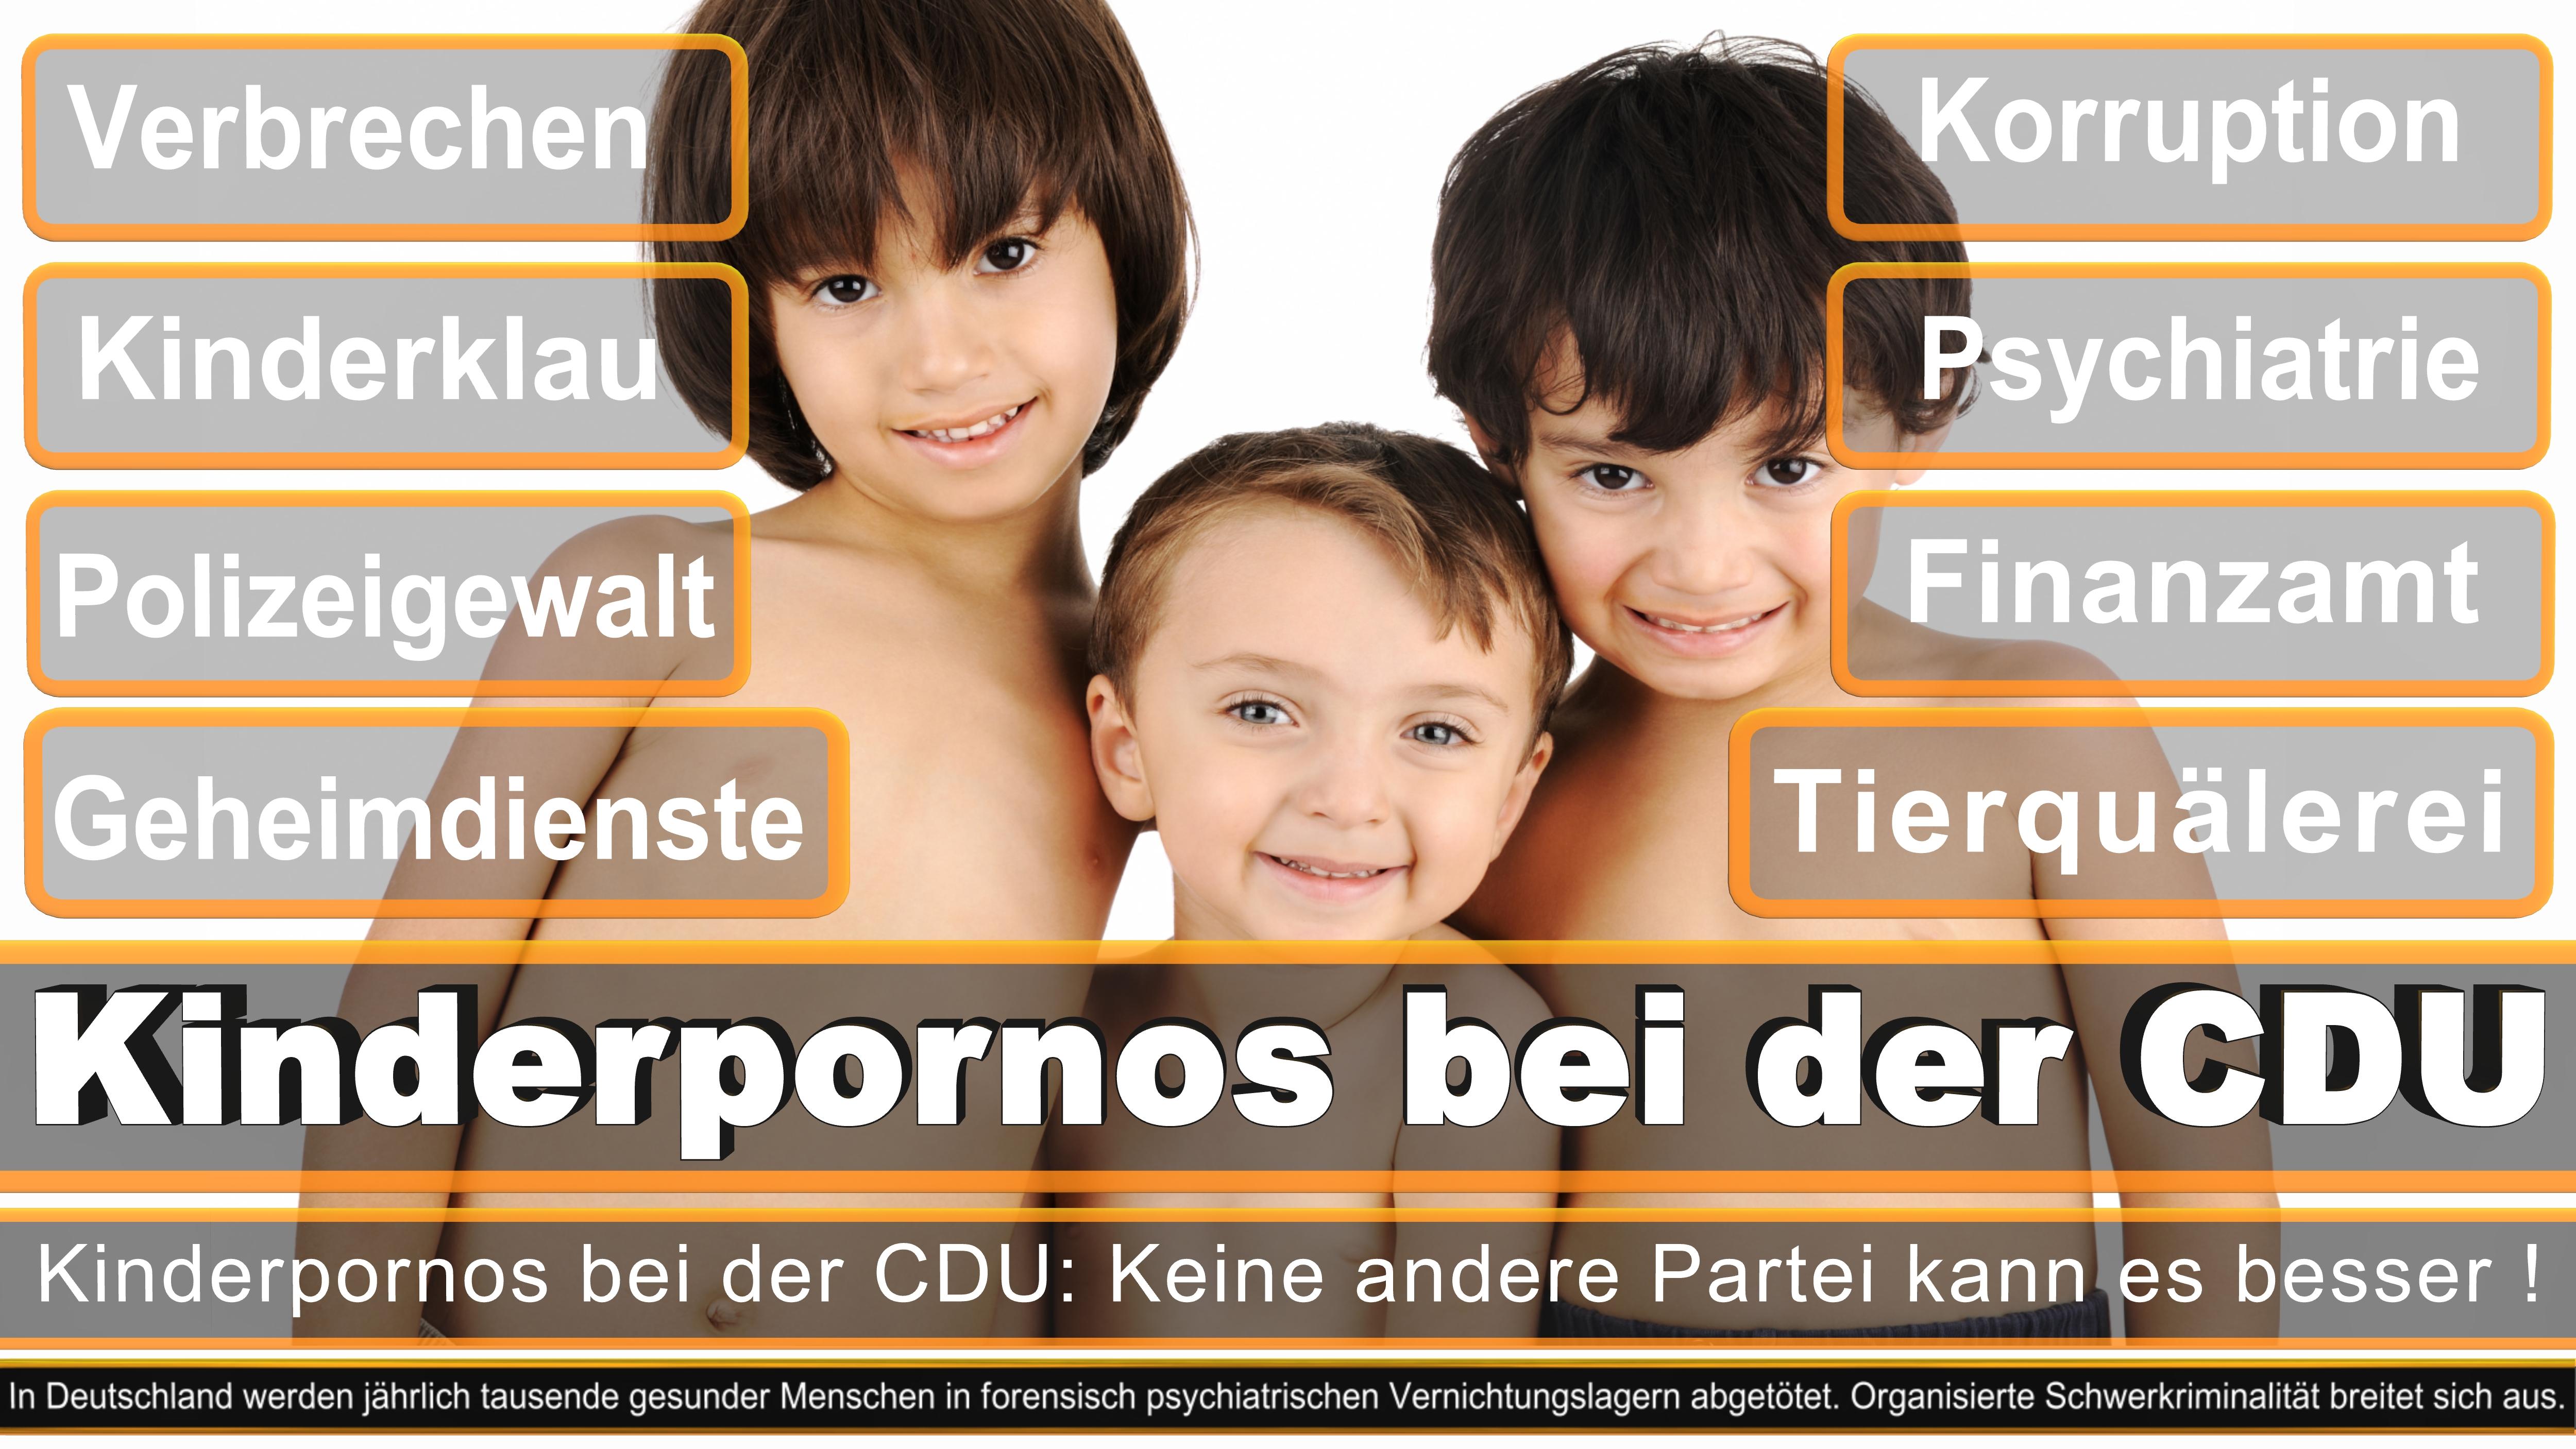 CDU Bielefeld, Ortverband, Fraktion, Rat, Ratsmitglieder, Vorstand